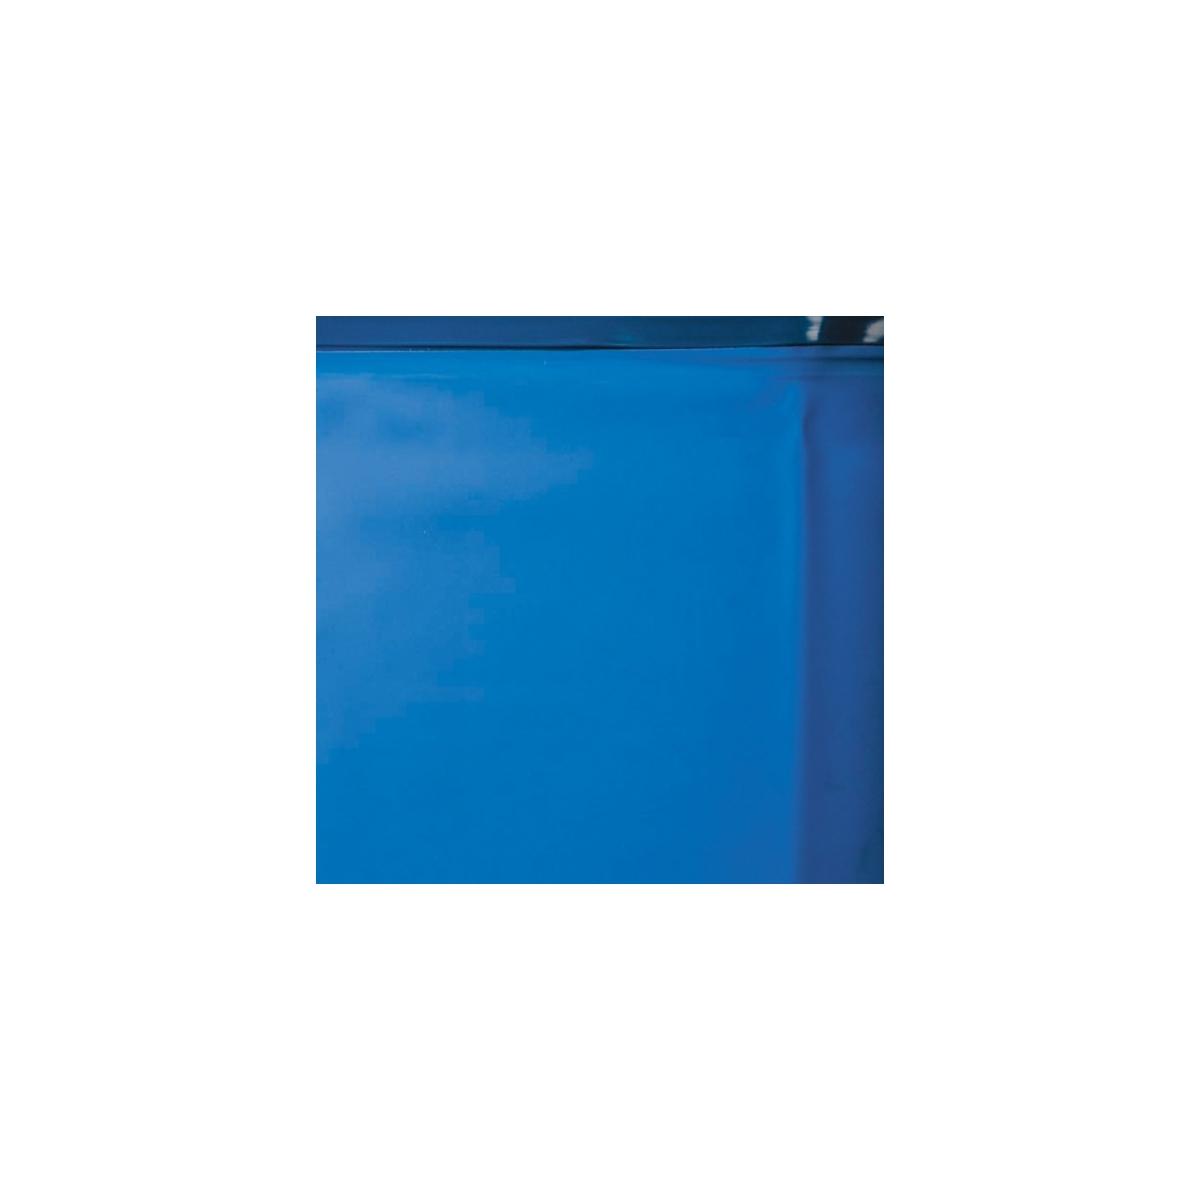 Liner Azul piscina Gre ovalada 75/100 - Altura 120 - Sistema Overlap